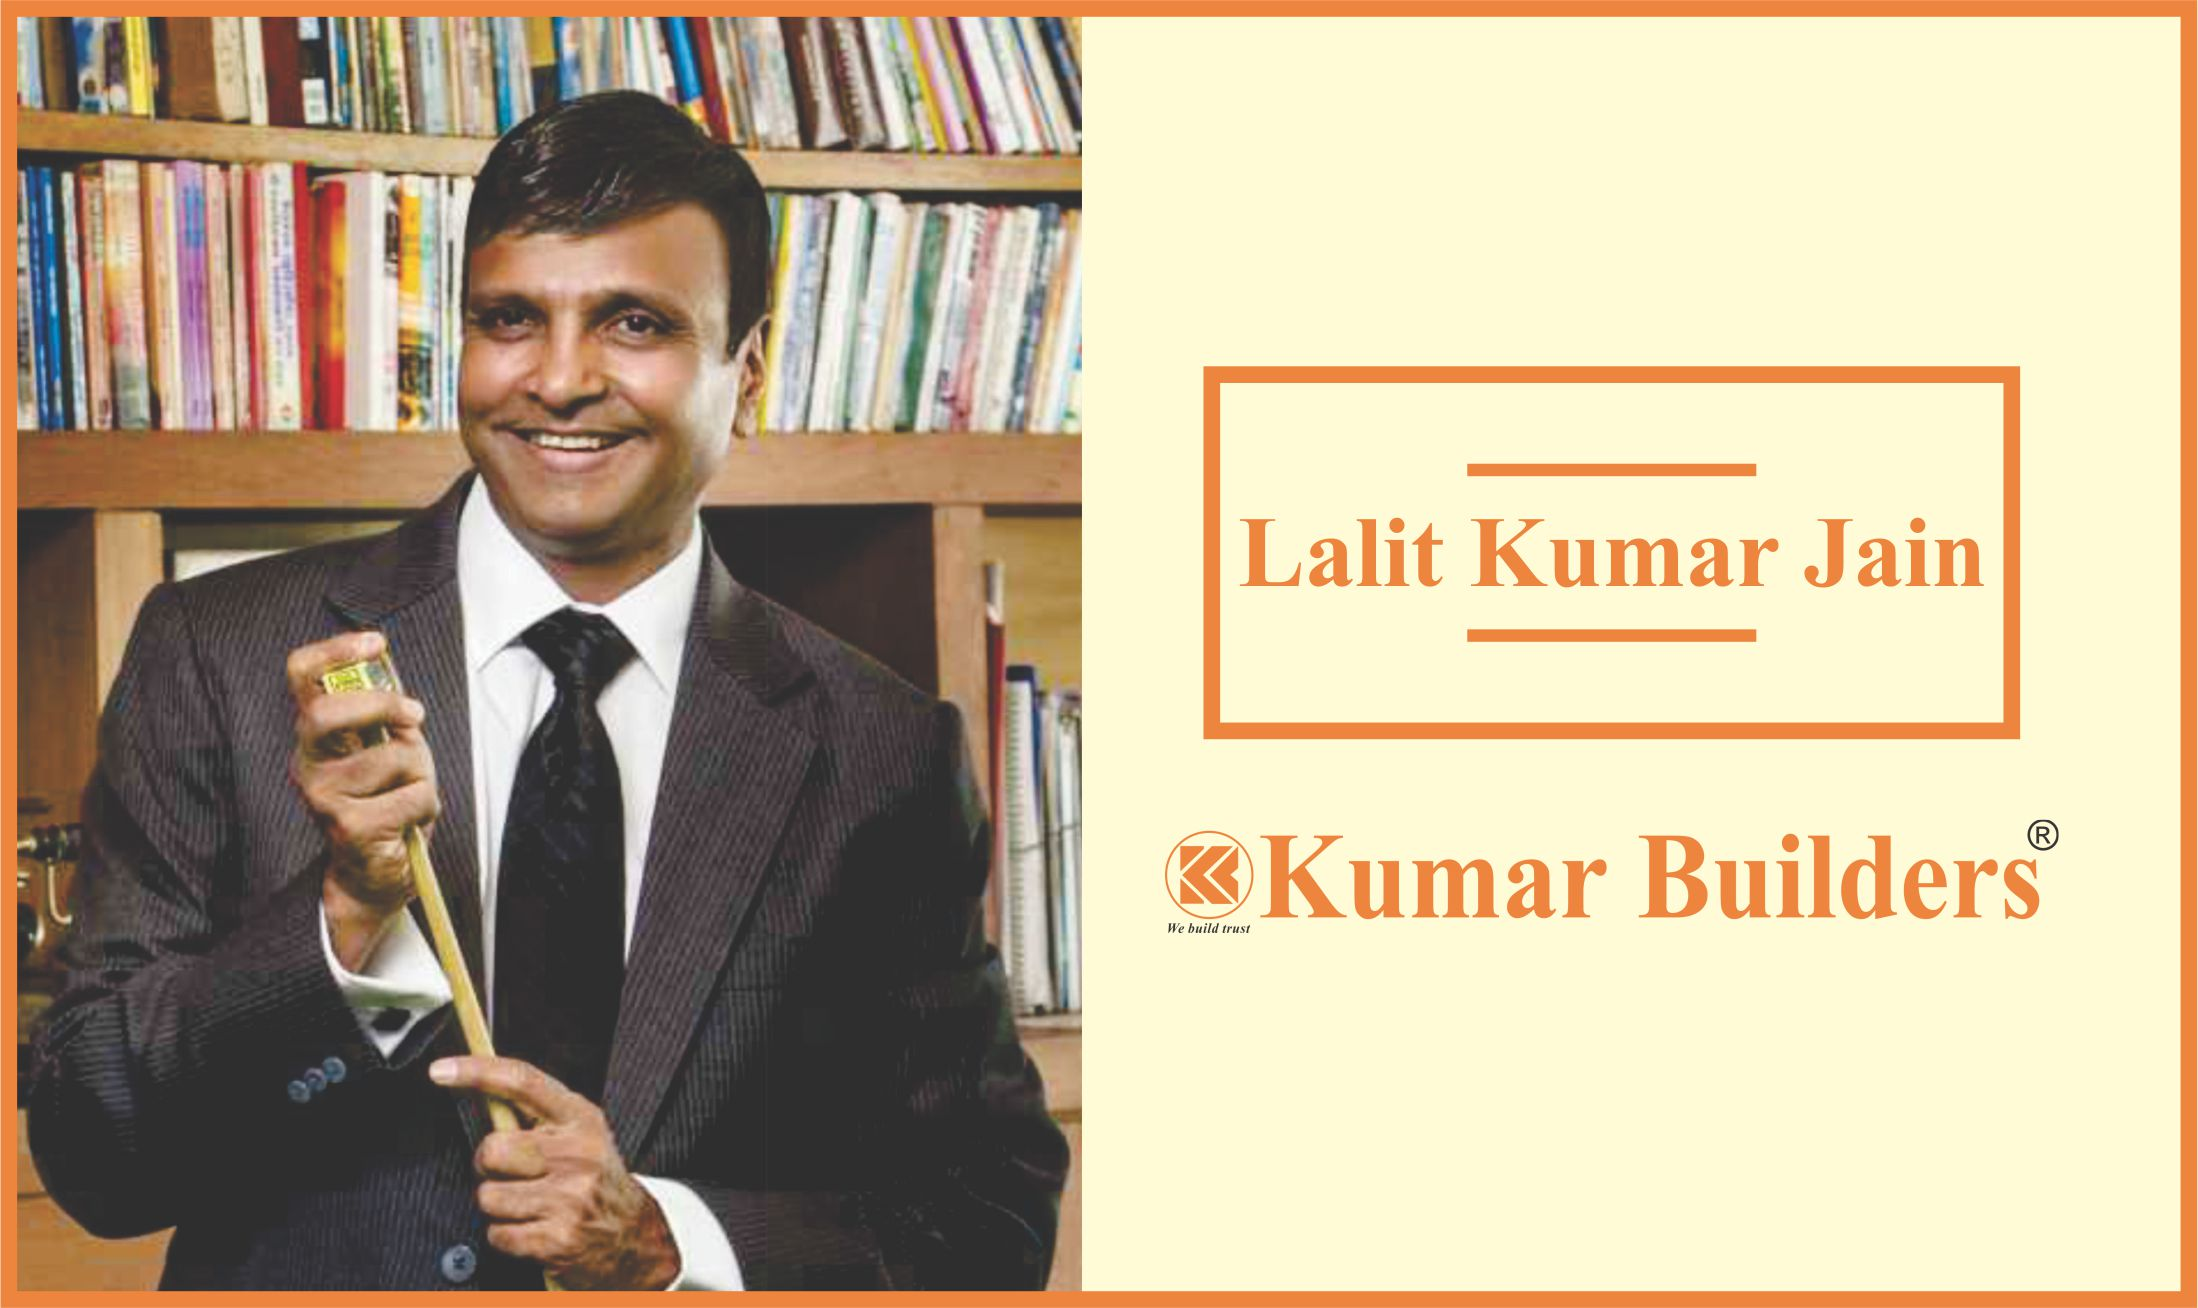 Lalit Kumar Jain – Famous Builders in Pune – Lalit Kumar Jain